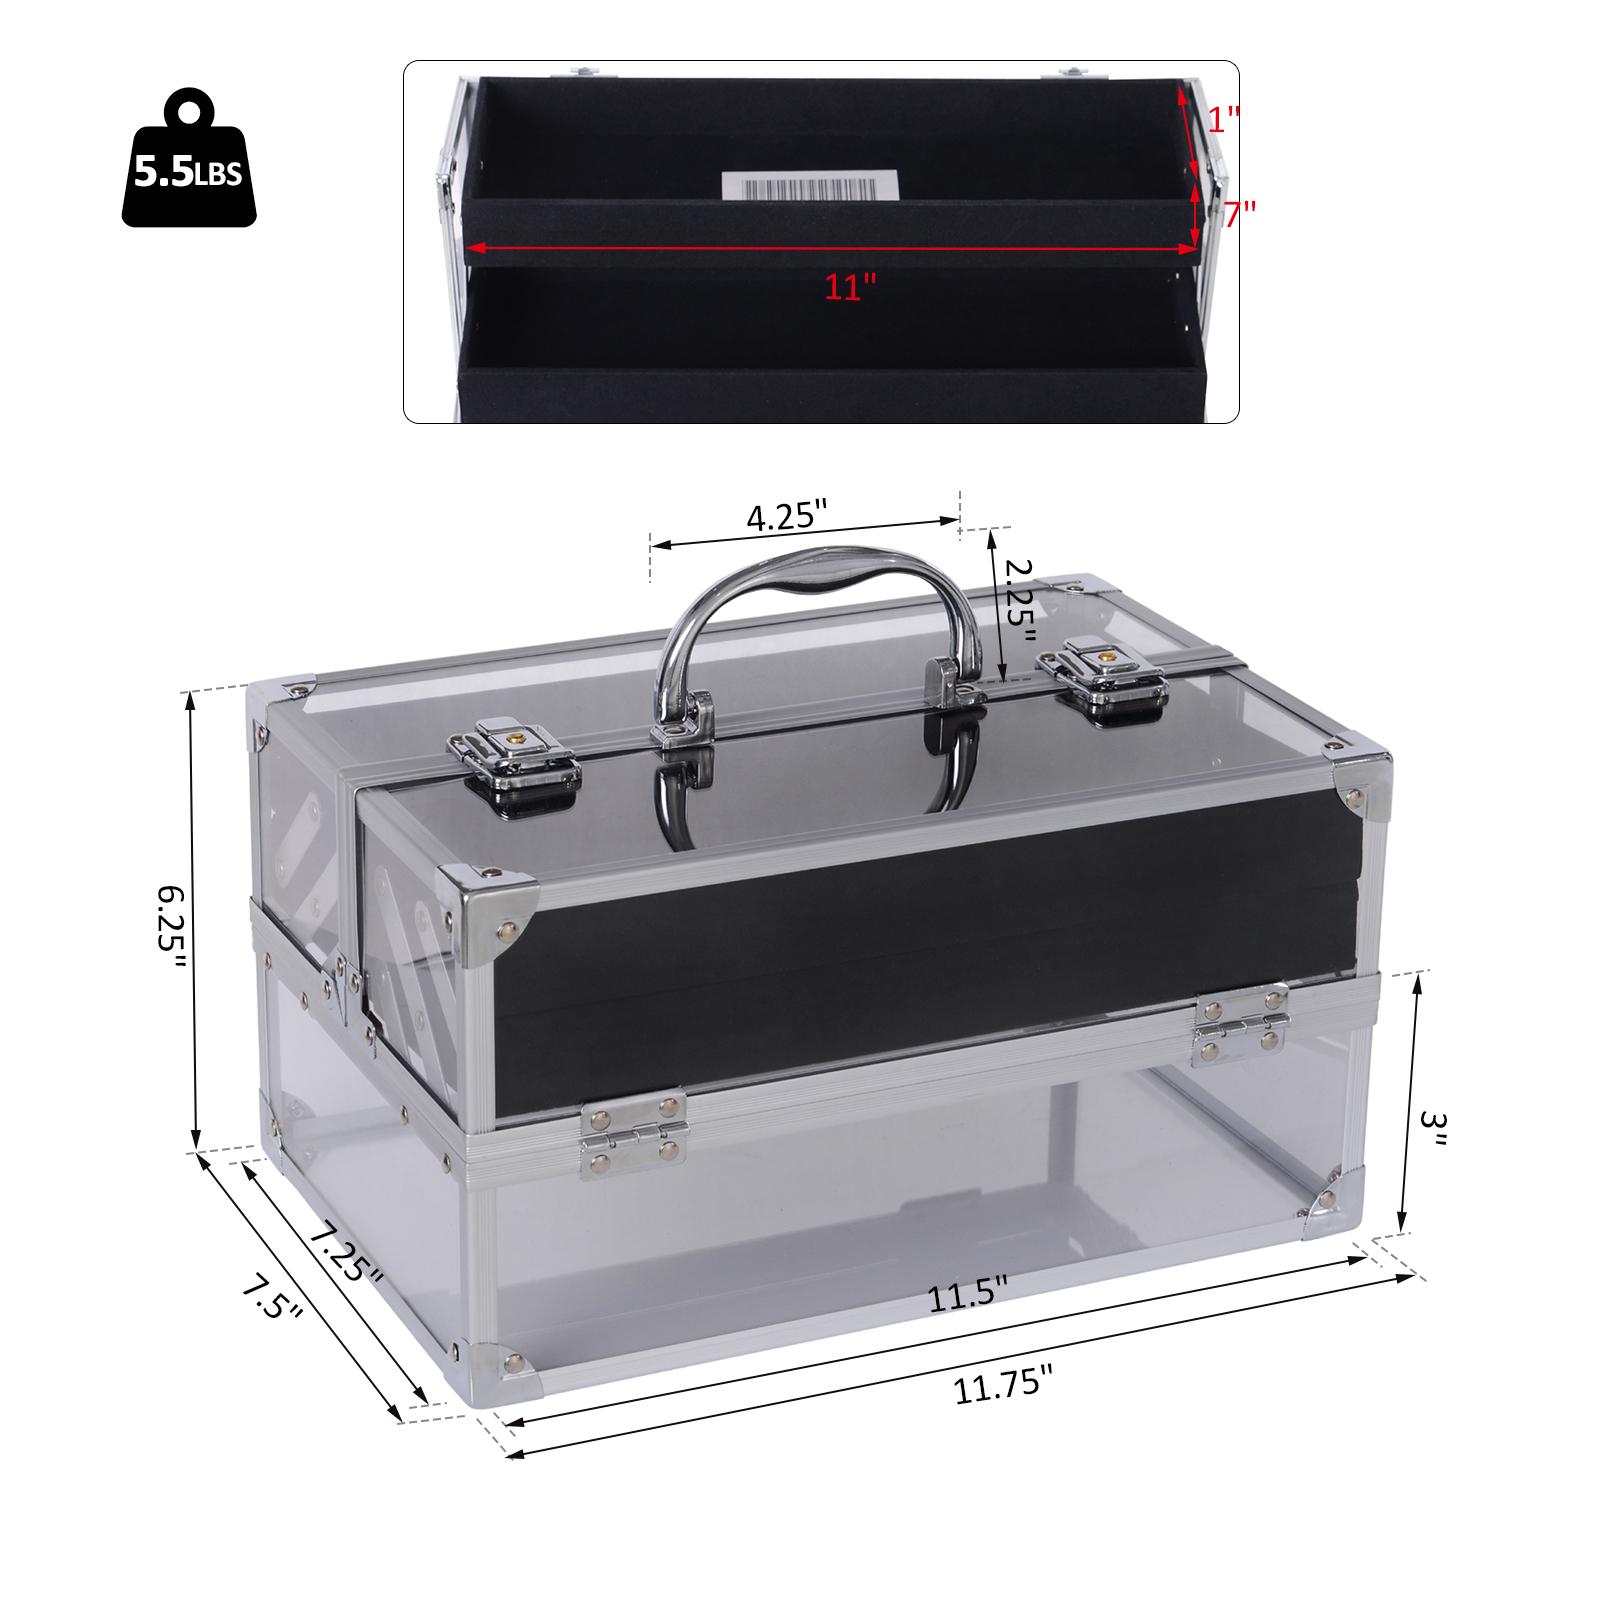 Portable-Makeup-Case-Train-Case-Lockable-Aluminum-with-4-Trays thumbnail 19